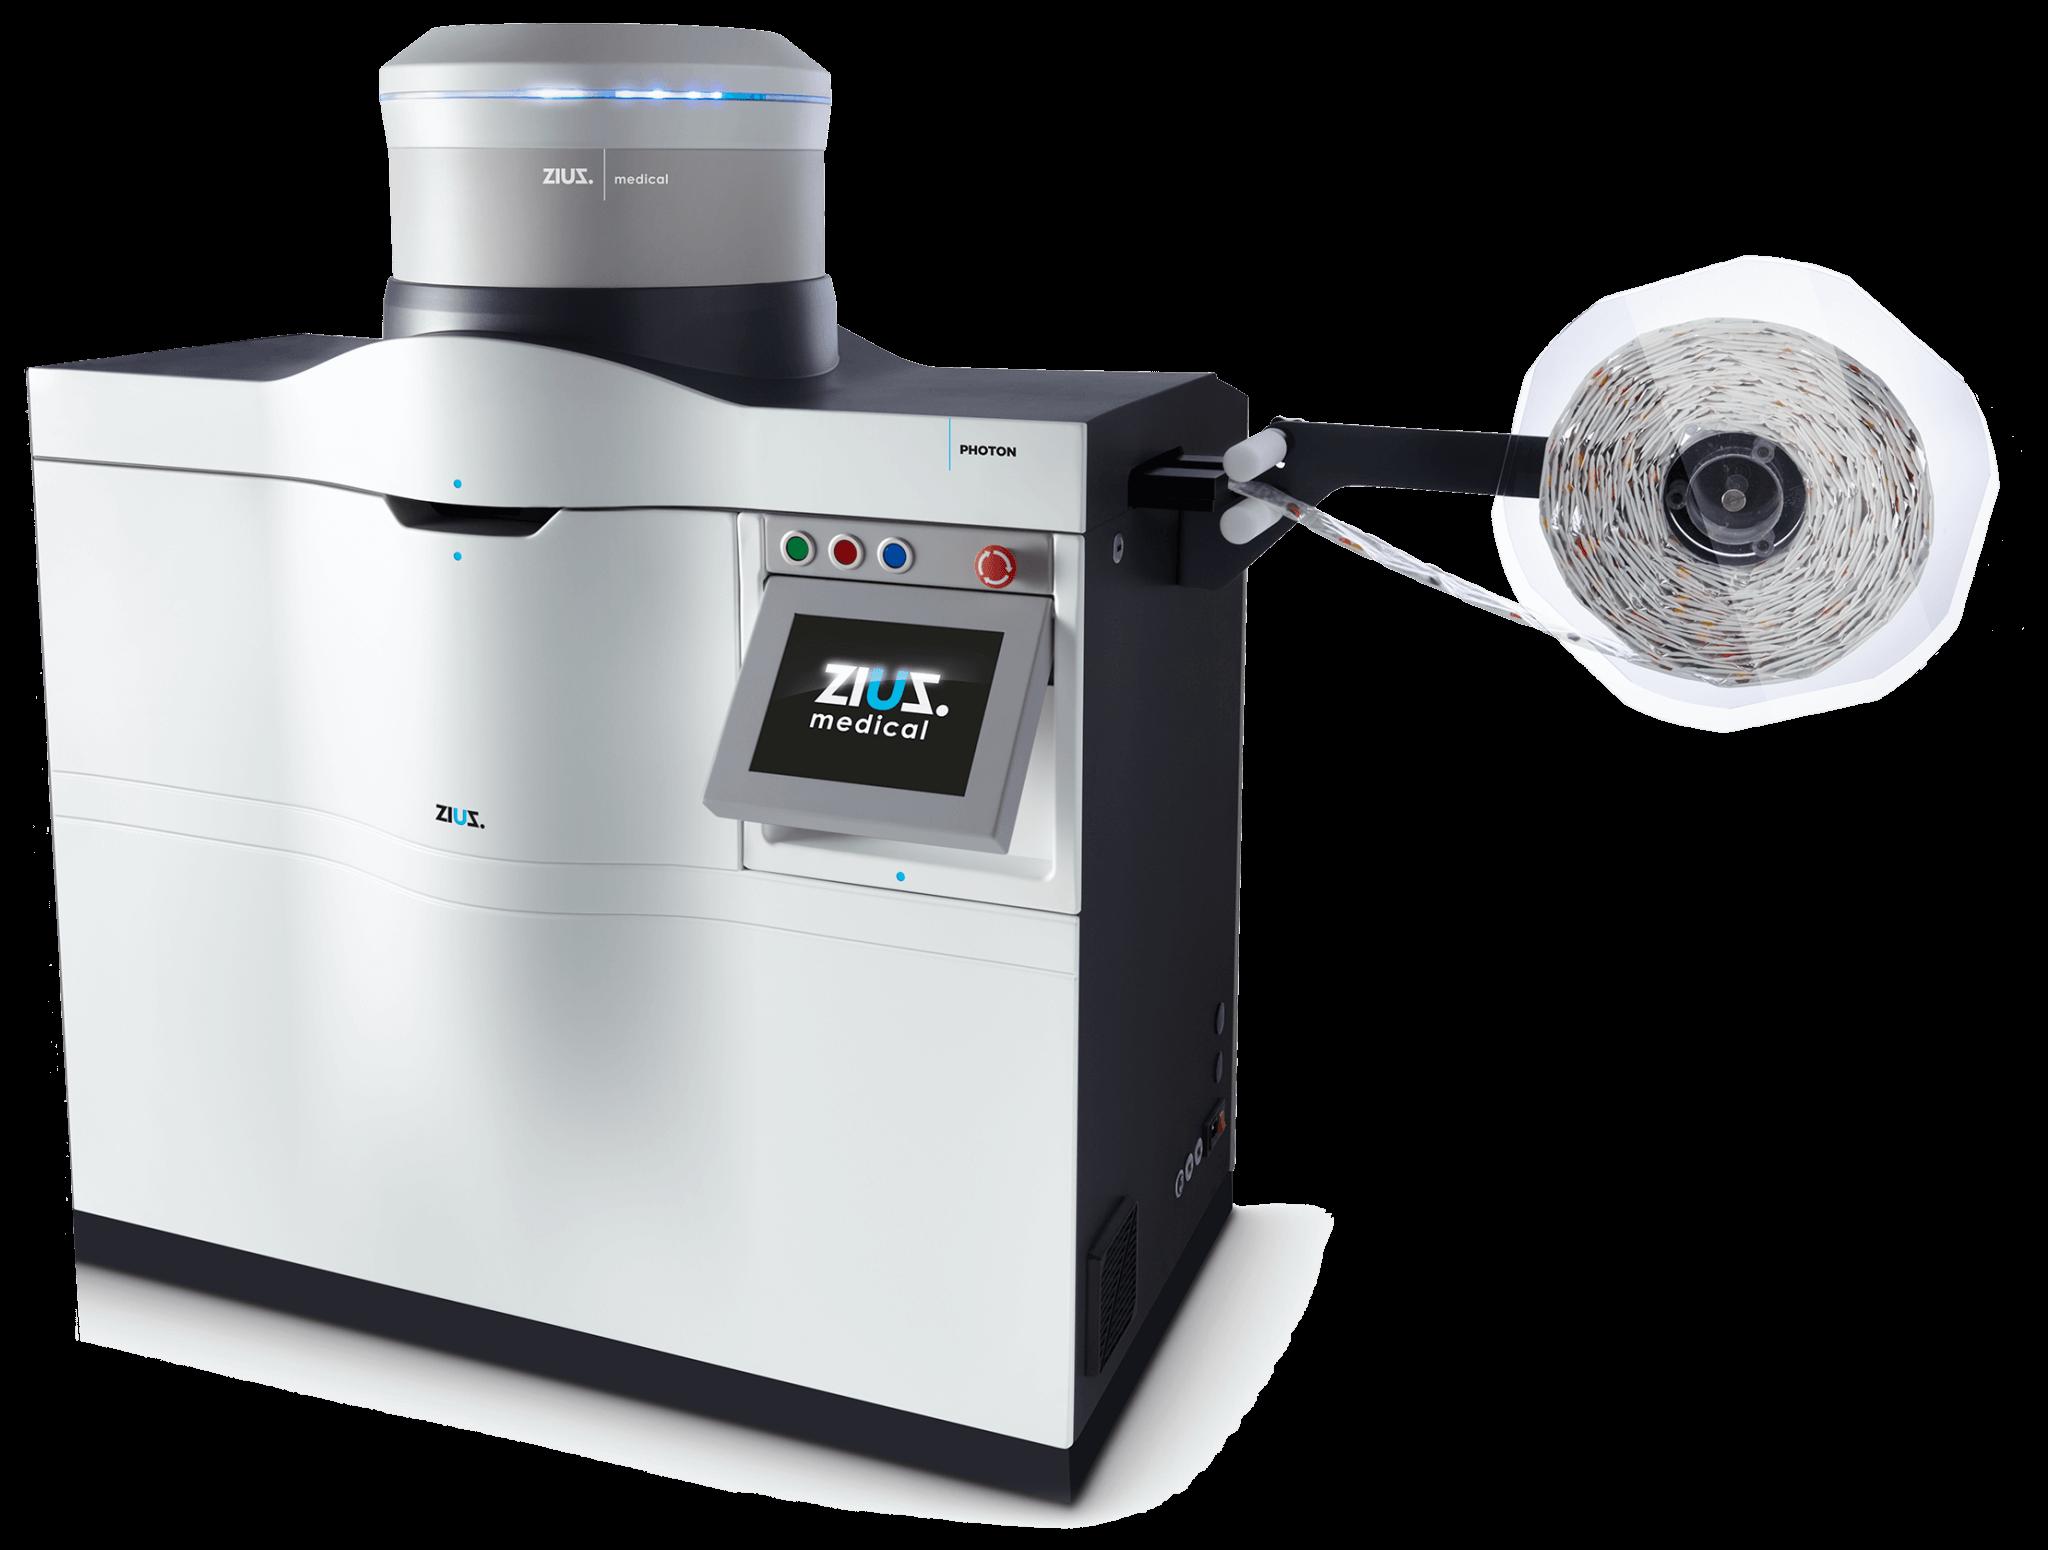 ZiuZ Photon - Medication dispensing checking device